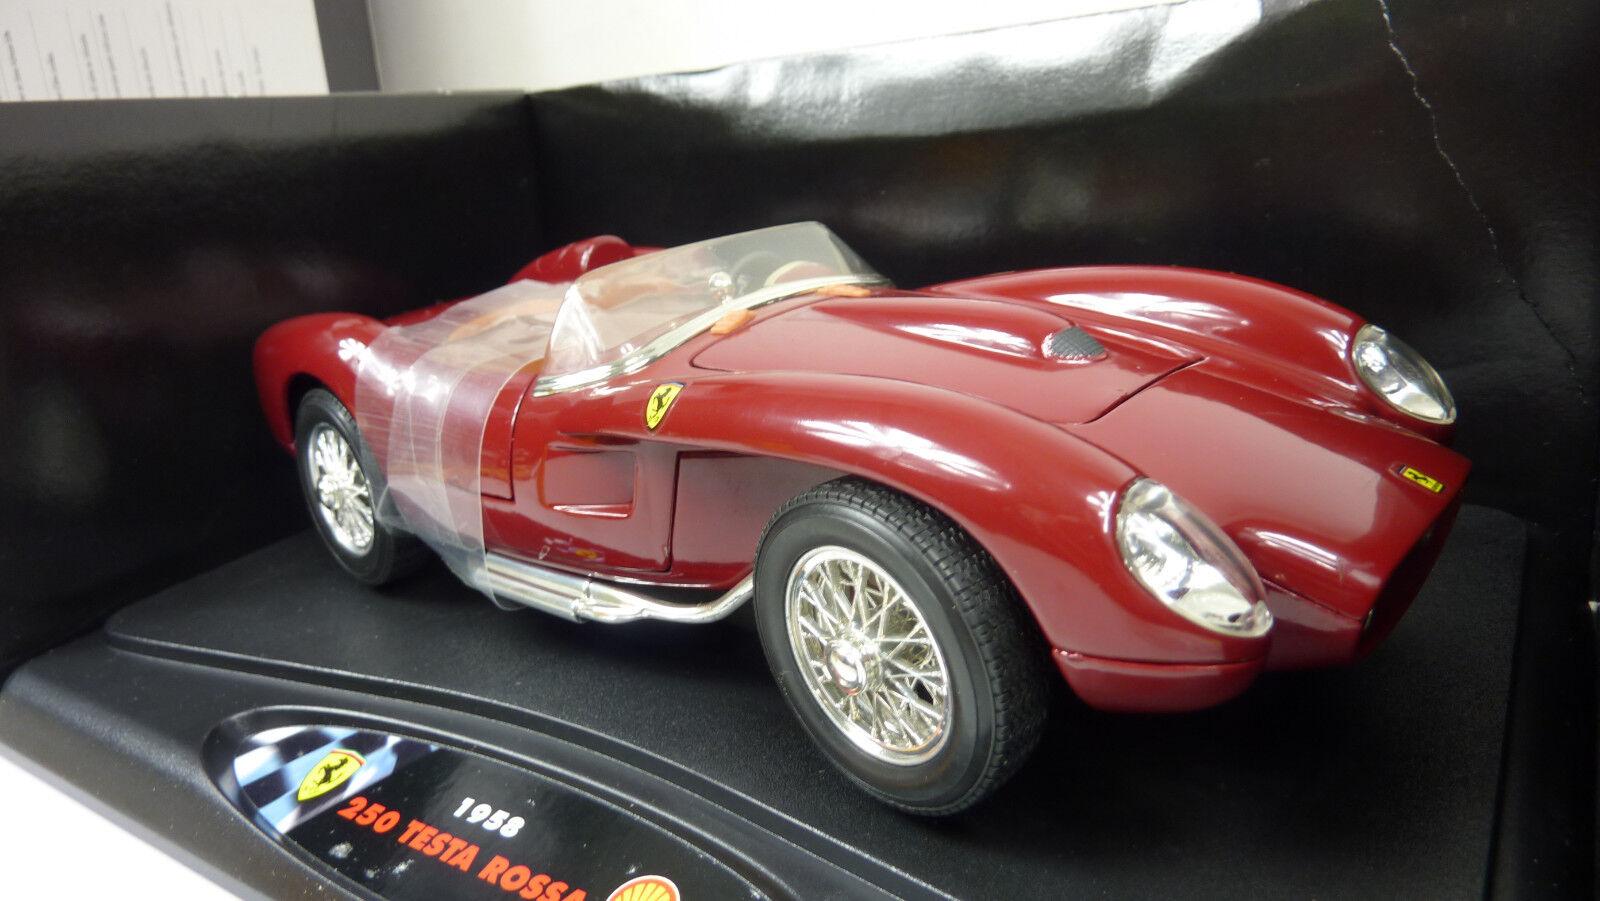 Shell Classico 1 18 Ferrari 250 Testa Rossa 1958  Shell Tanksäule in OVP (A786)  | Deutschland Shop